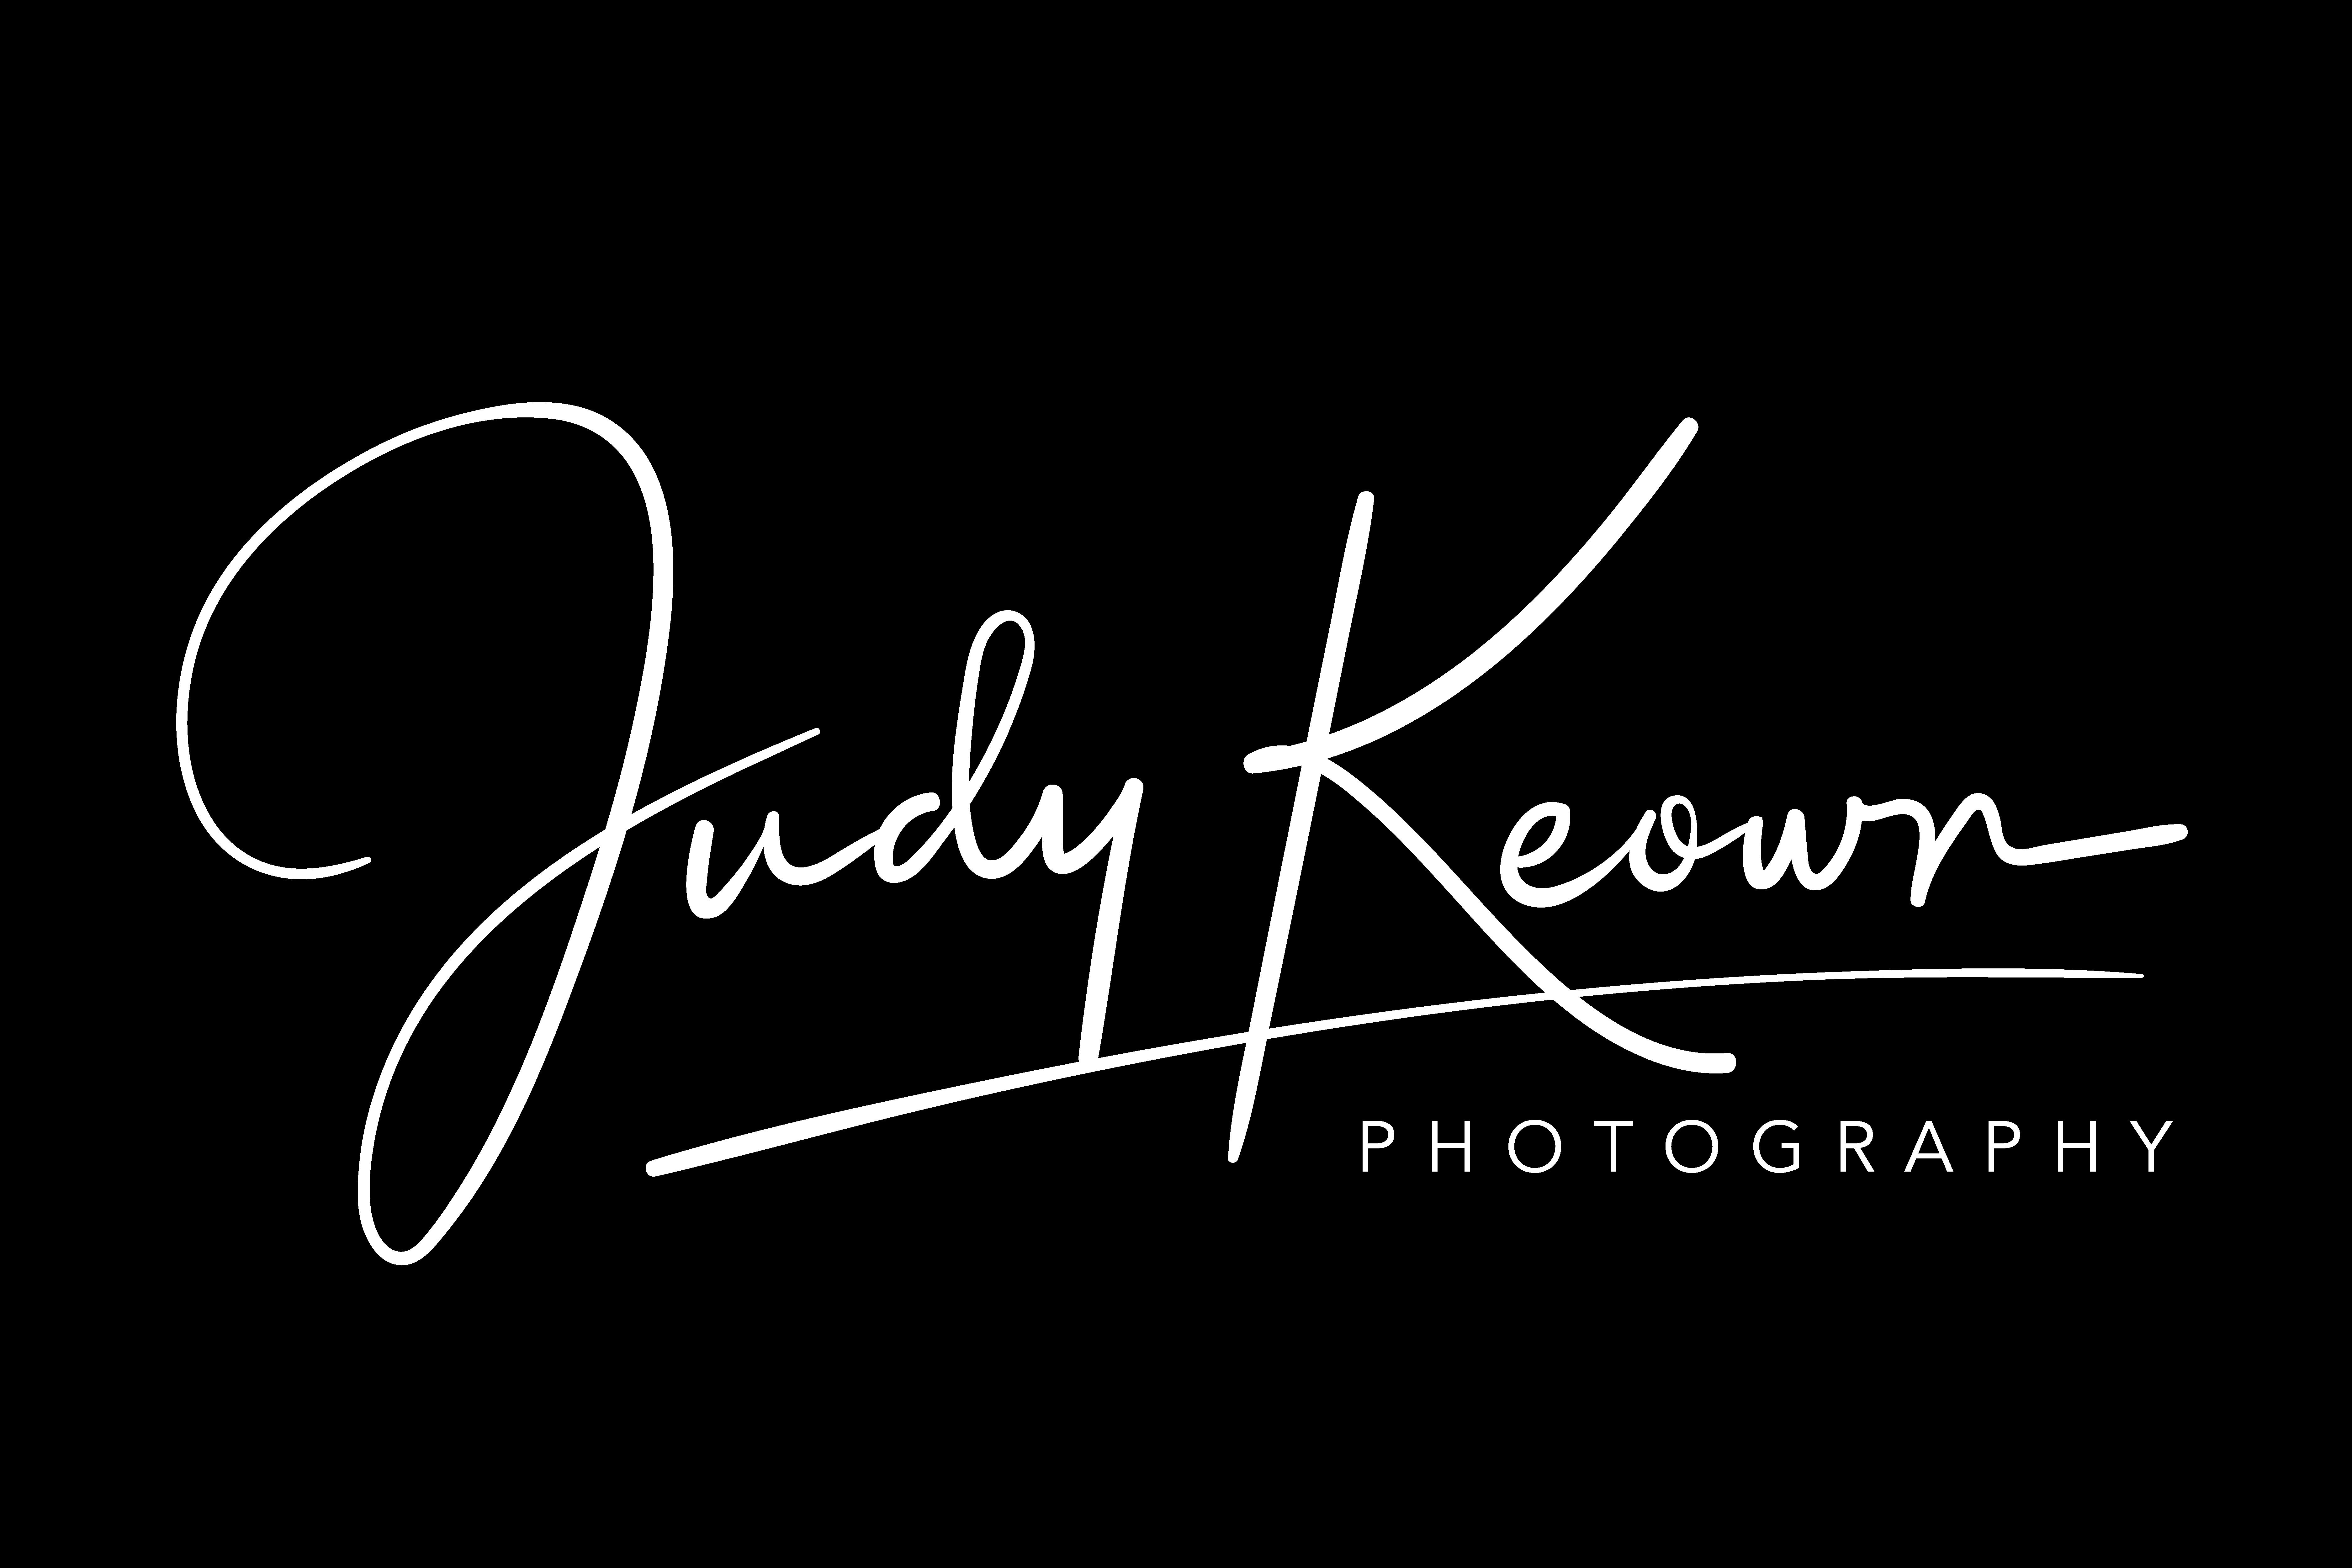 Judy Keown Photography